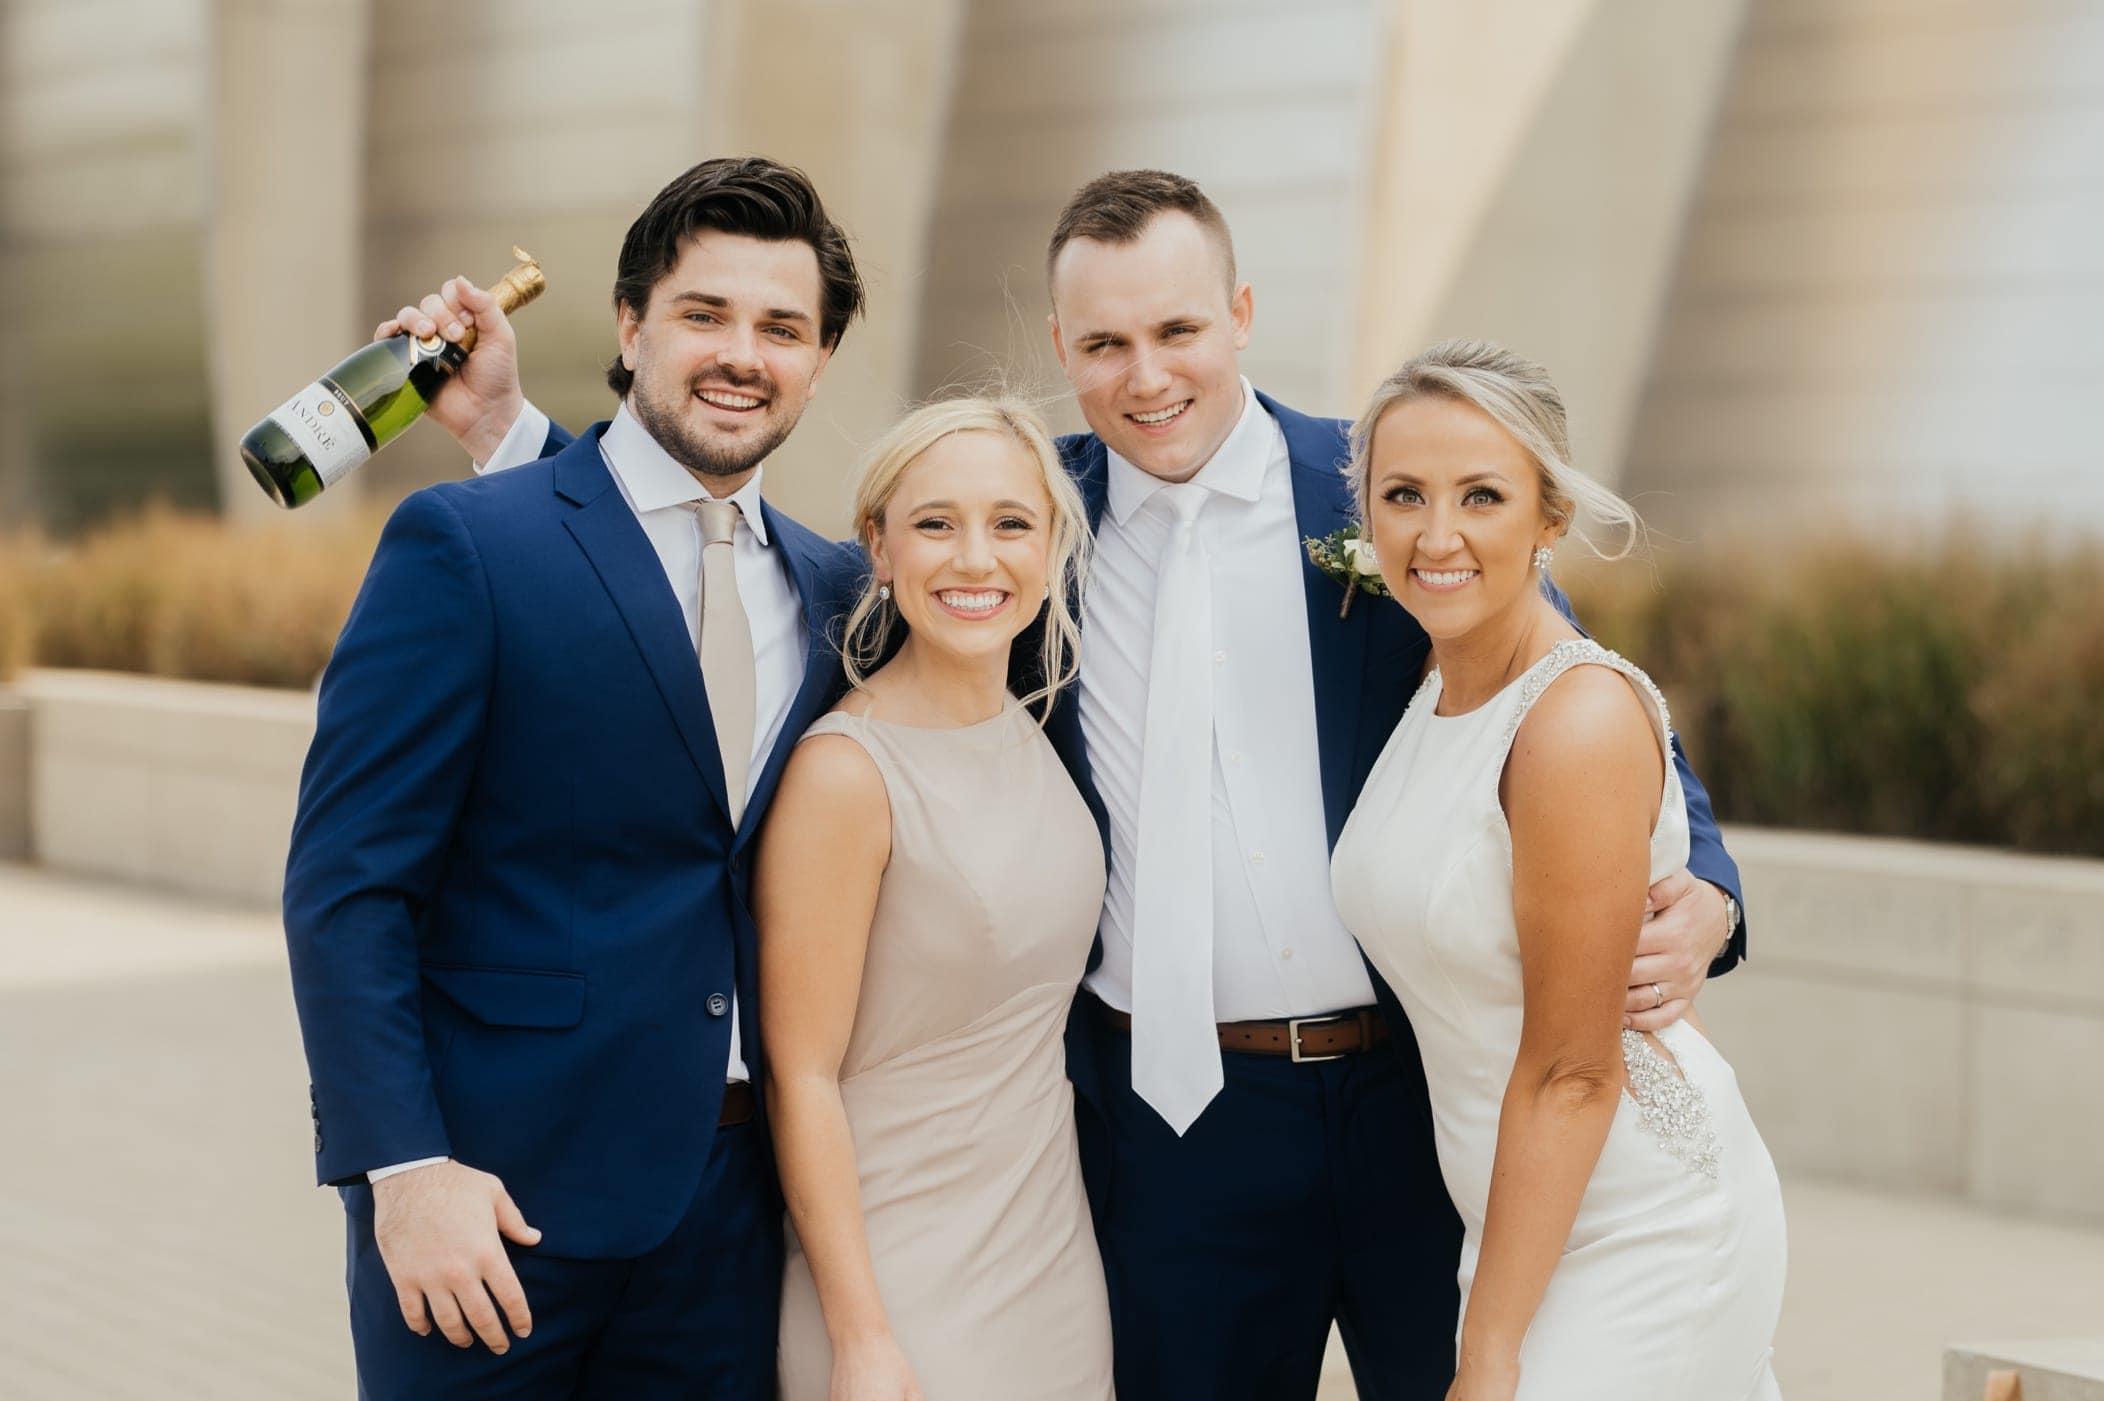 wedding party at kauffman center